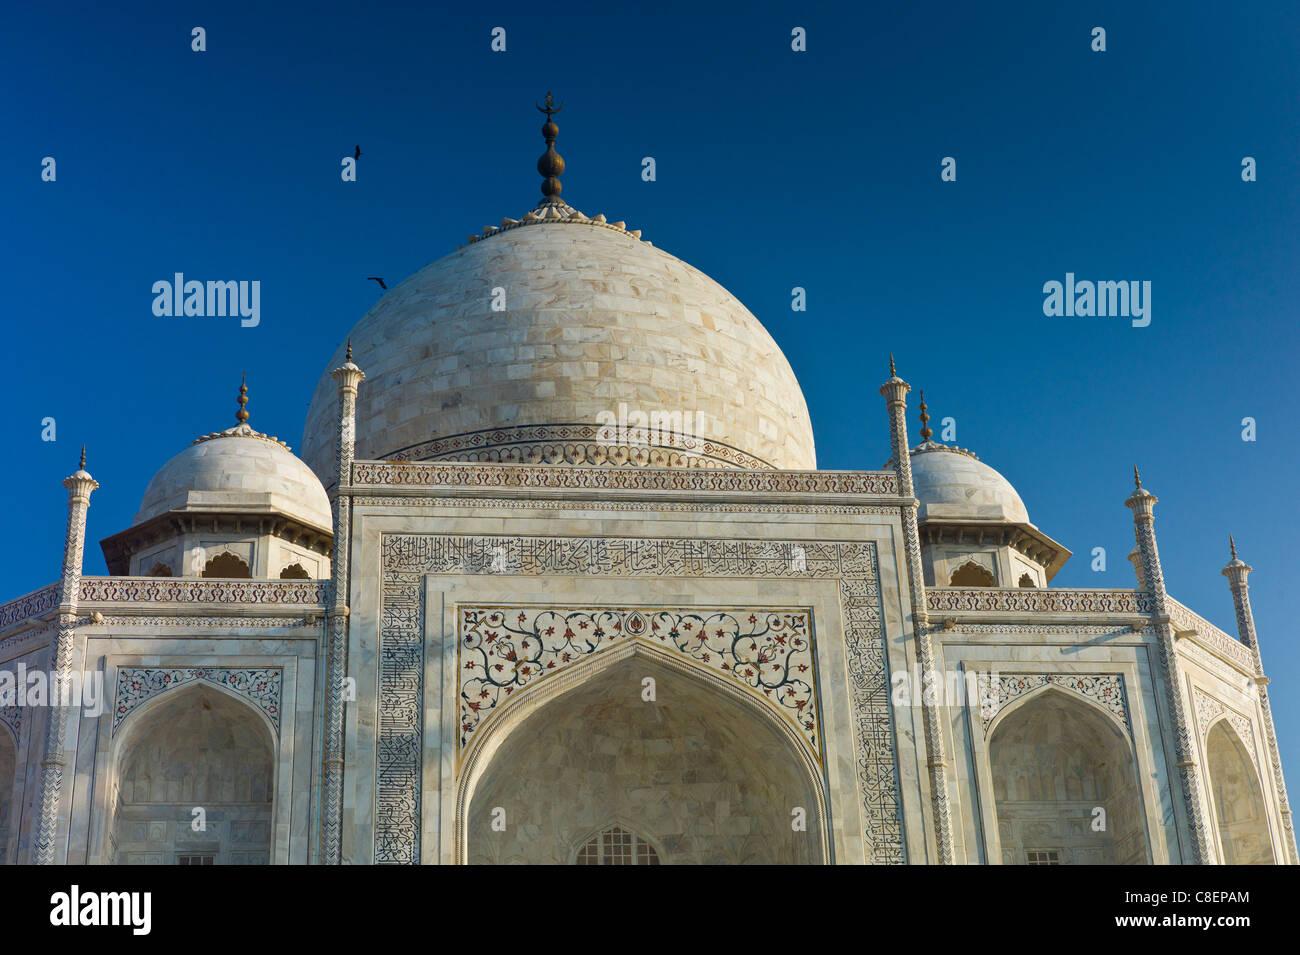 Taj Mahal-Mausoleum mit Vögel fliegen, Südansicht Detail Iwans mit Bas Relief Marmor, Uttar Pradesh, Indien Stockbild